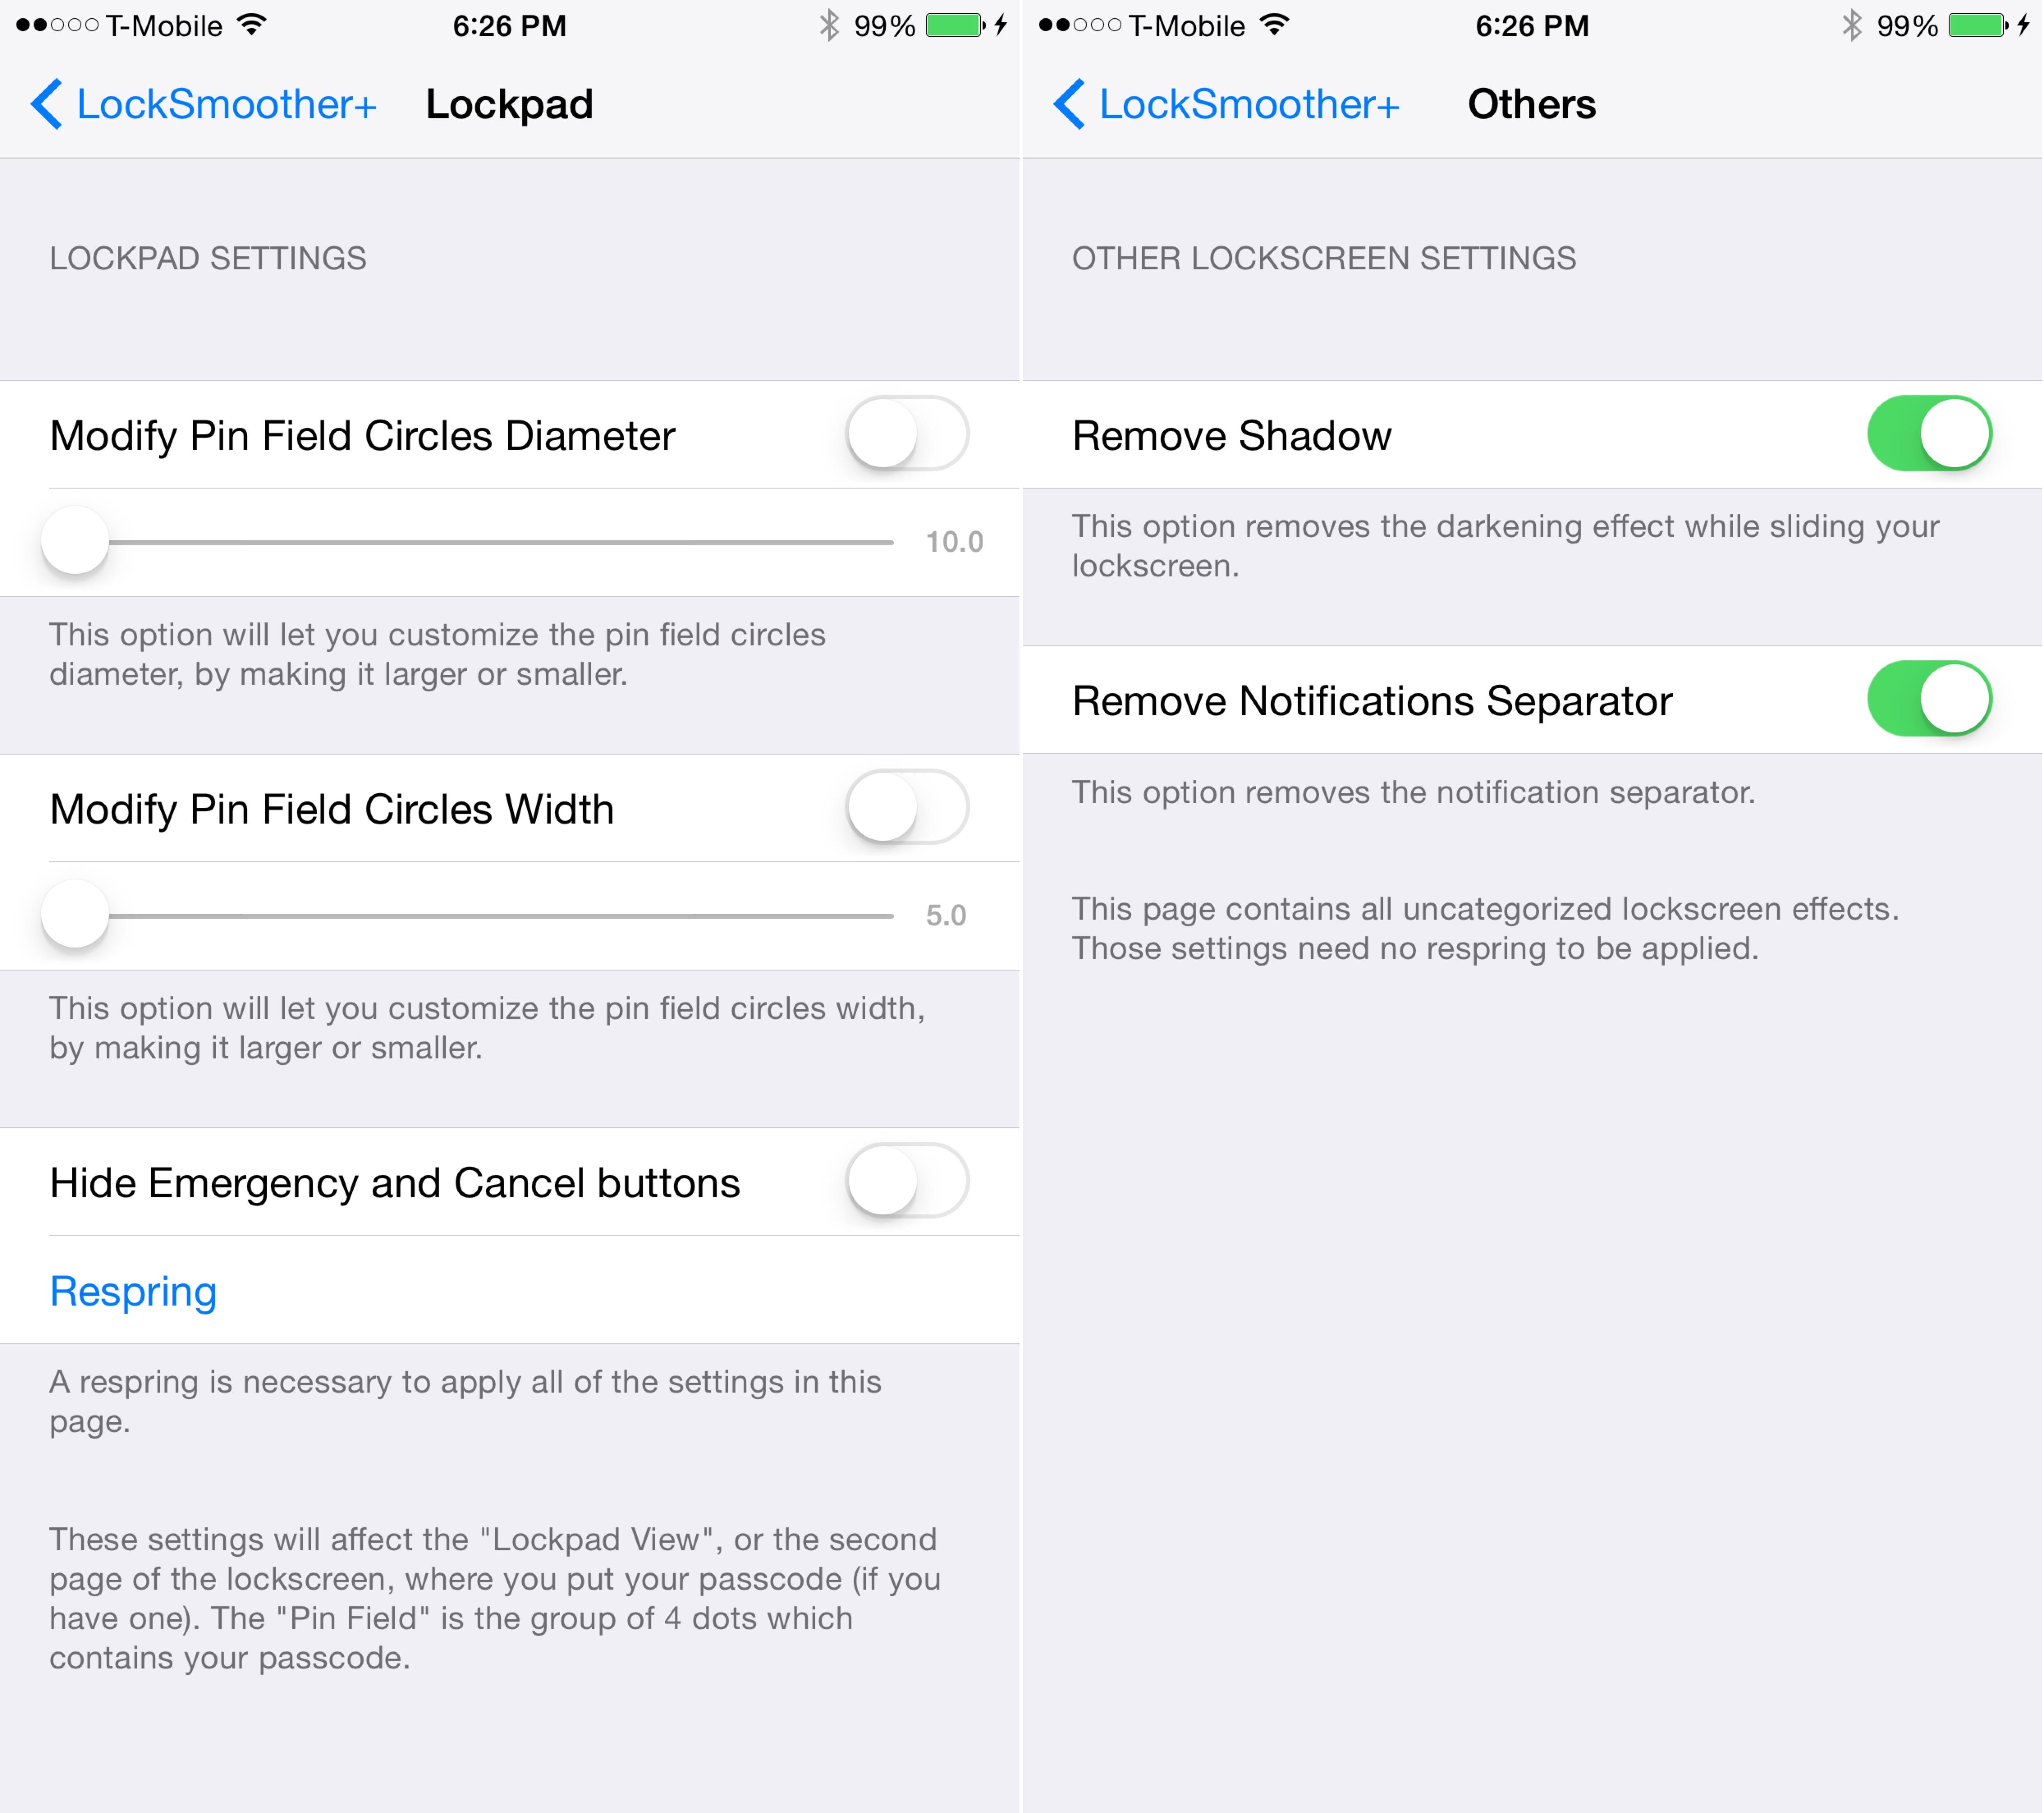 LockSmoother+ preferences 2